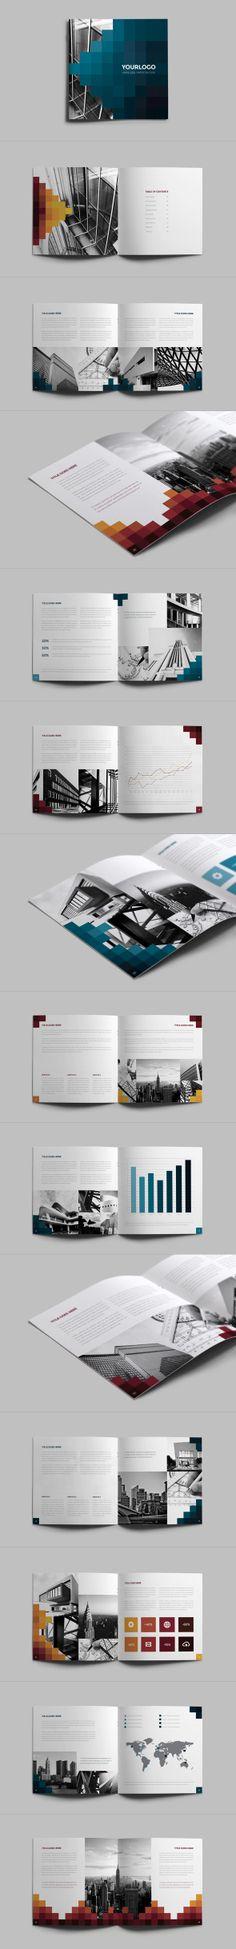 Pixels Square Brochure. Download here: http://graphicriver.net/item/pixels-square-brochure/6586956?ref=abradesign #design #brochure